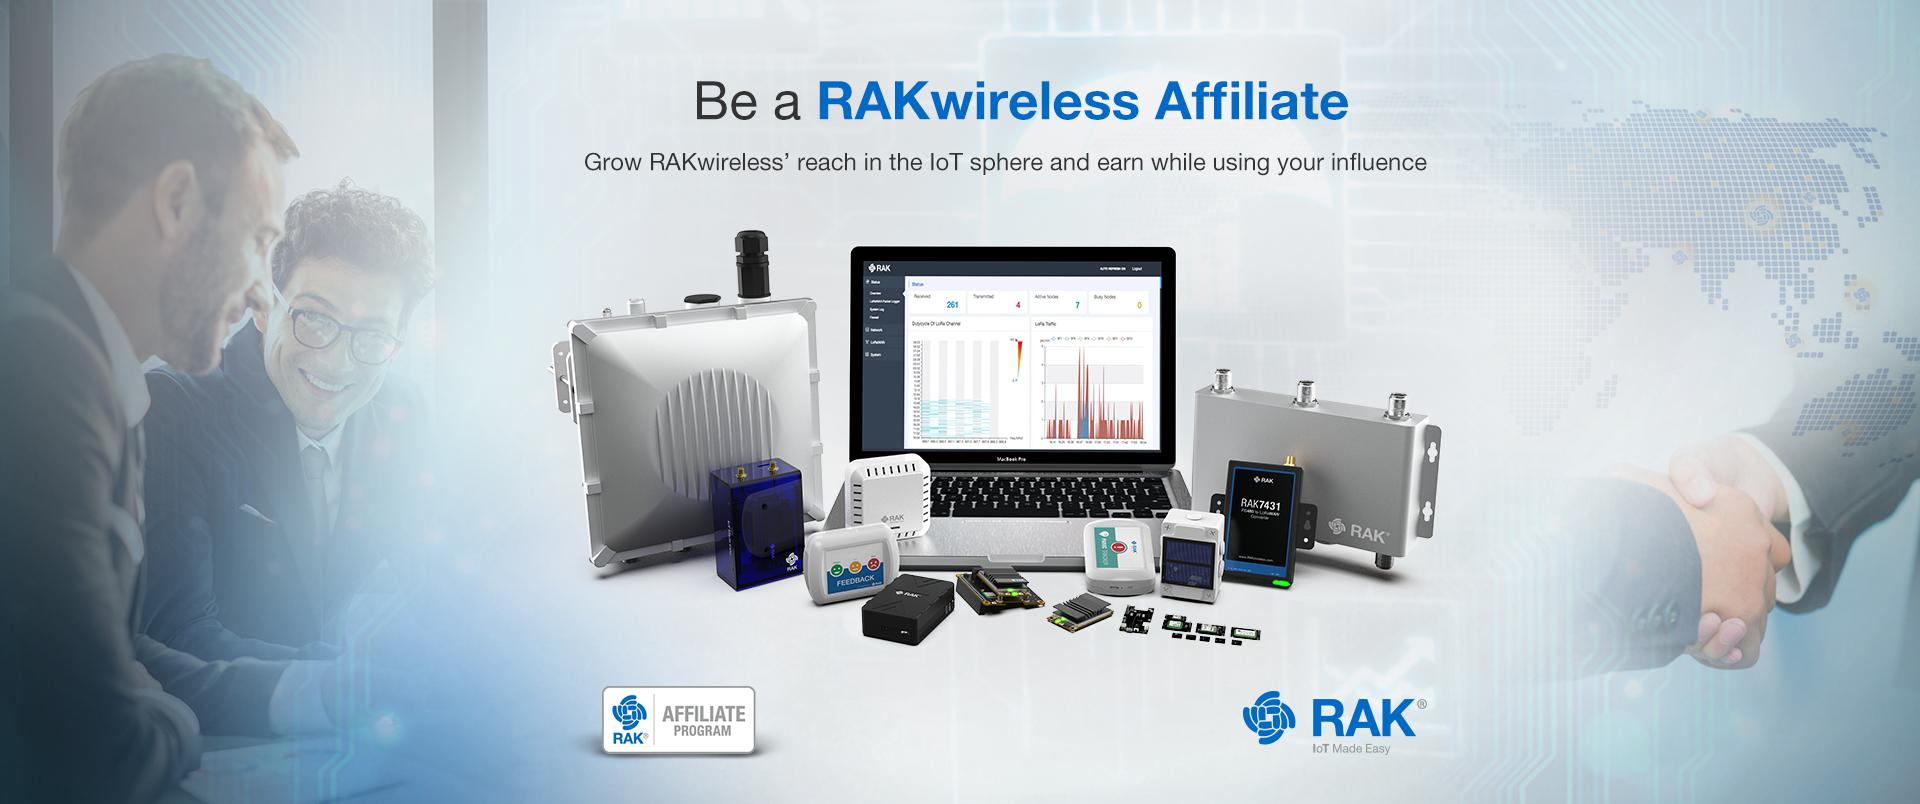 Become A RAKwireless Affiliate!